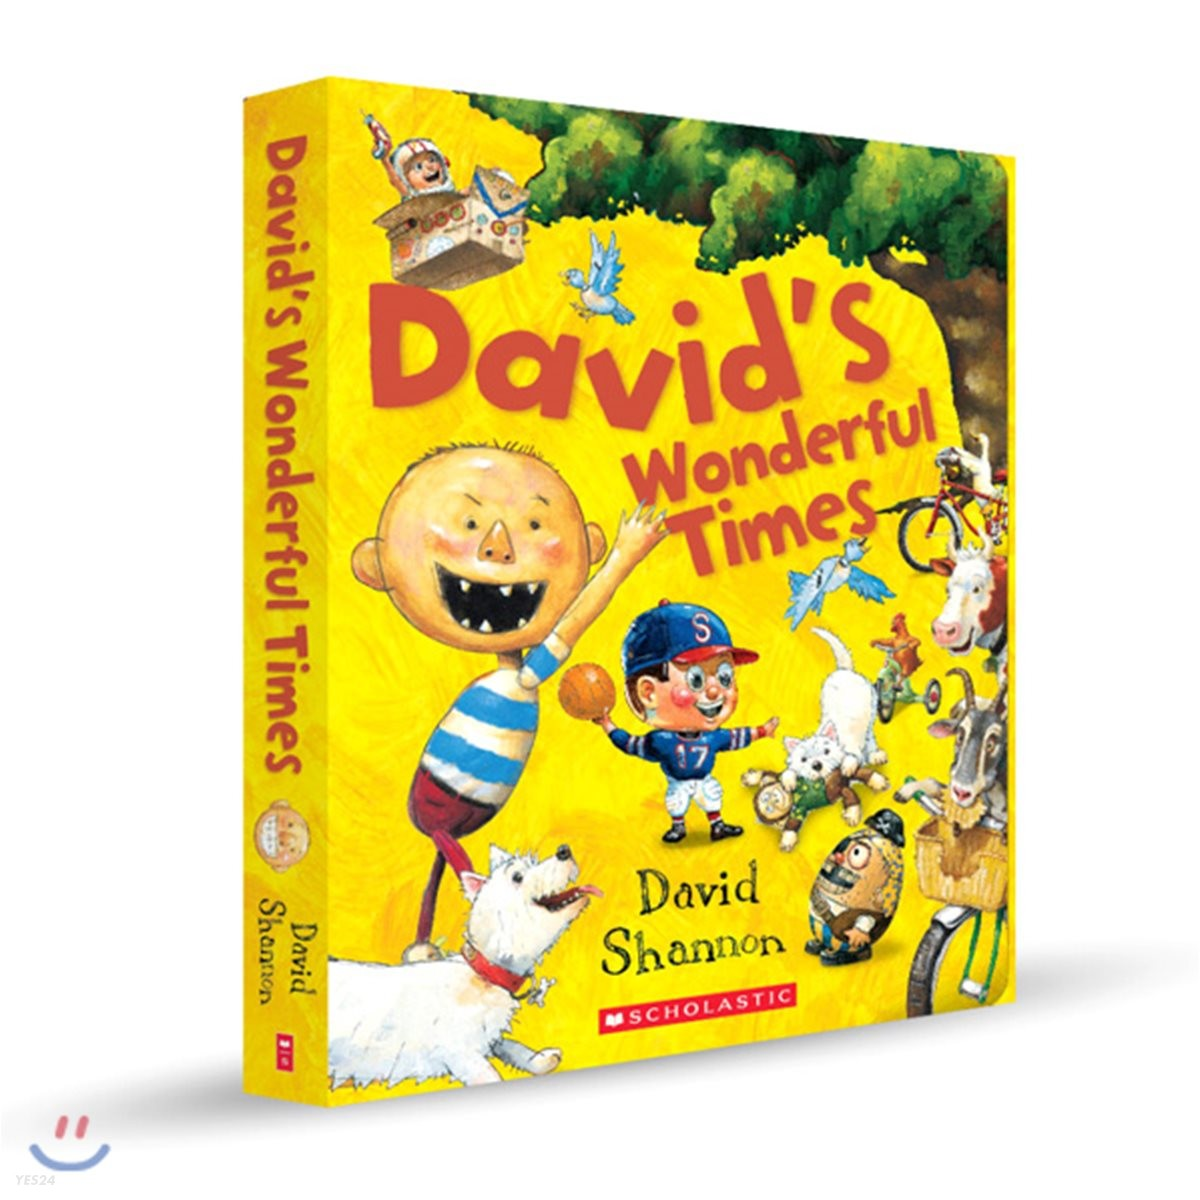 David's Wonderful Times